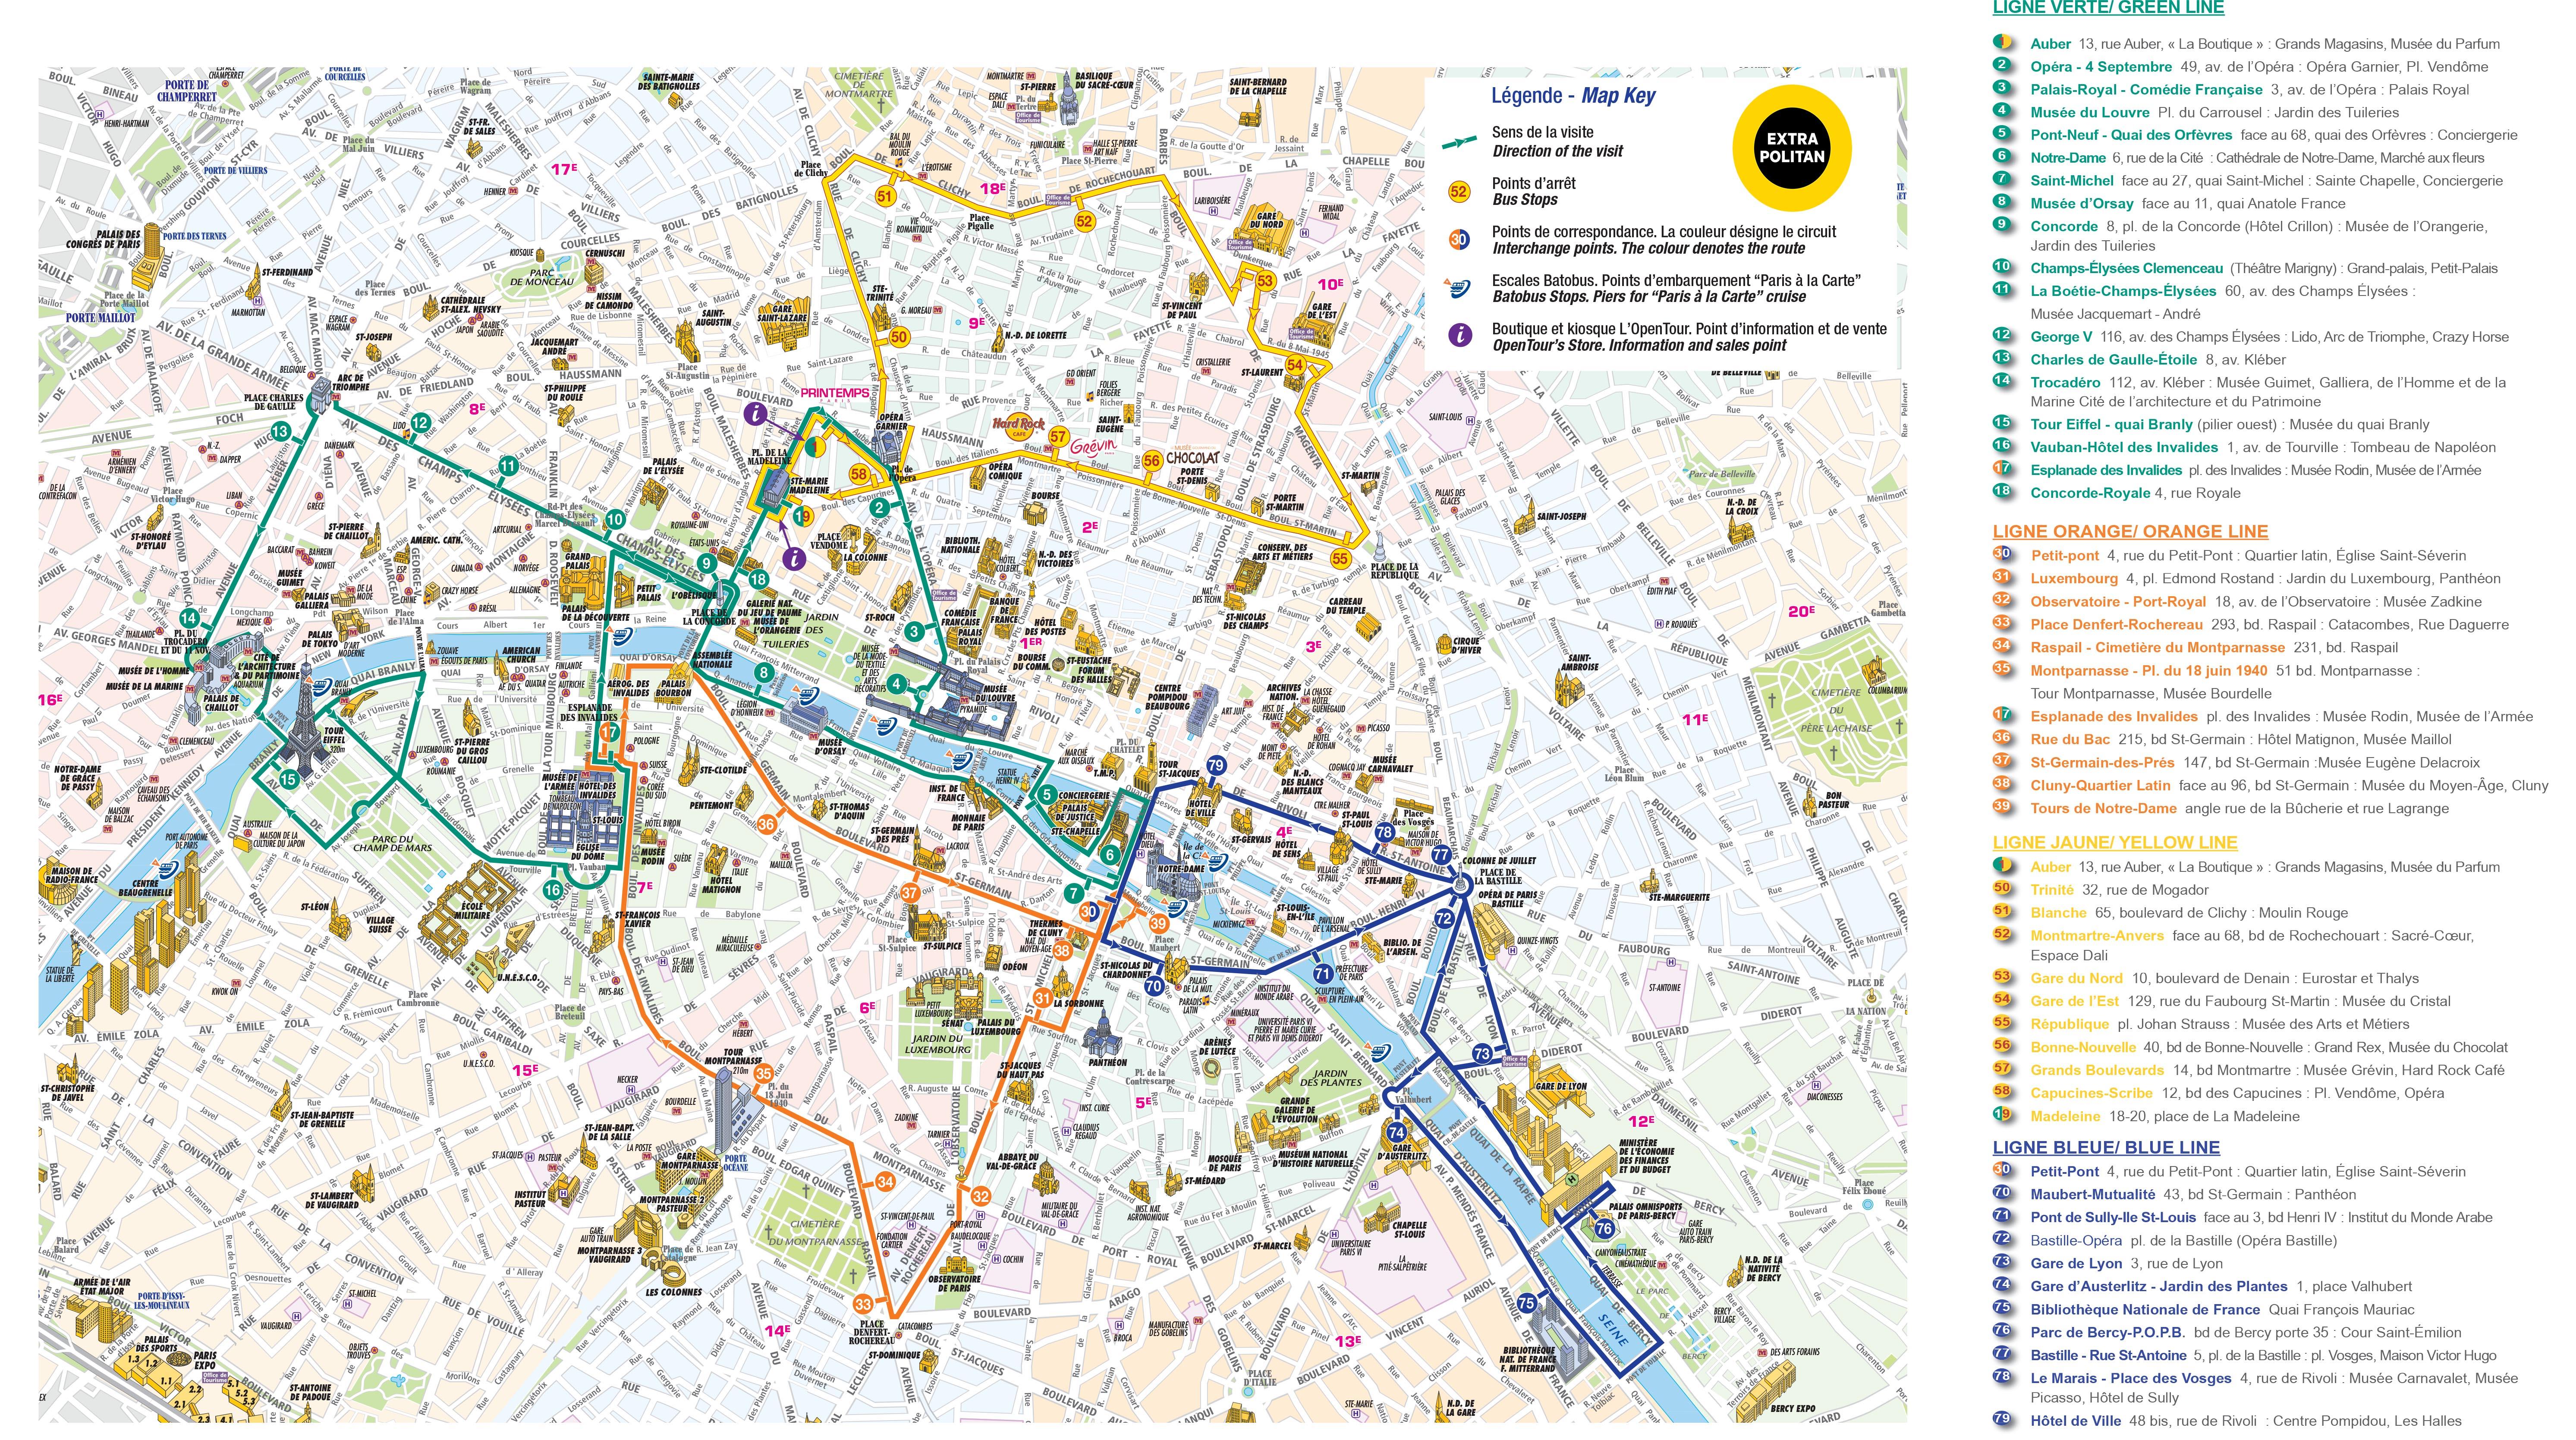 Sightseeing Map Of Paris - Large map of paris france